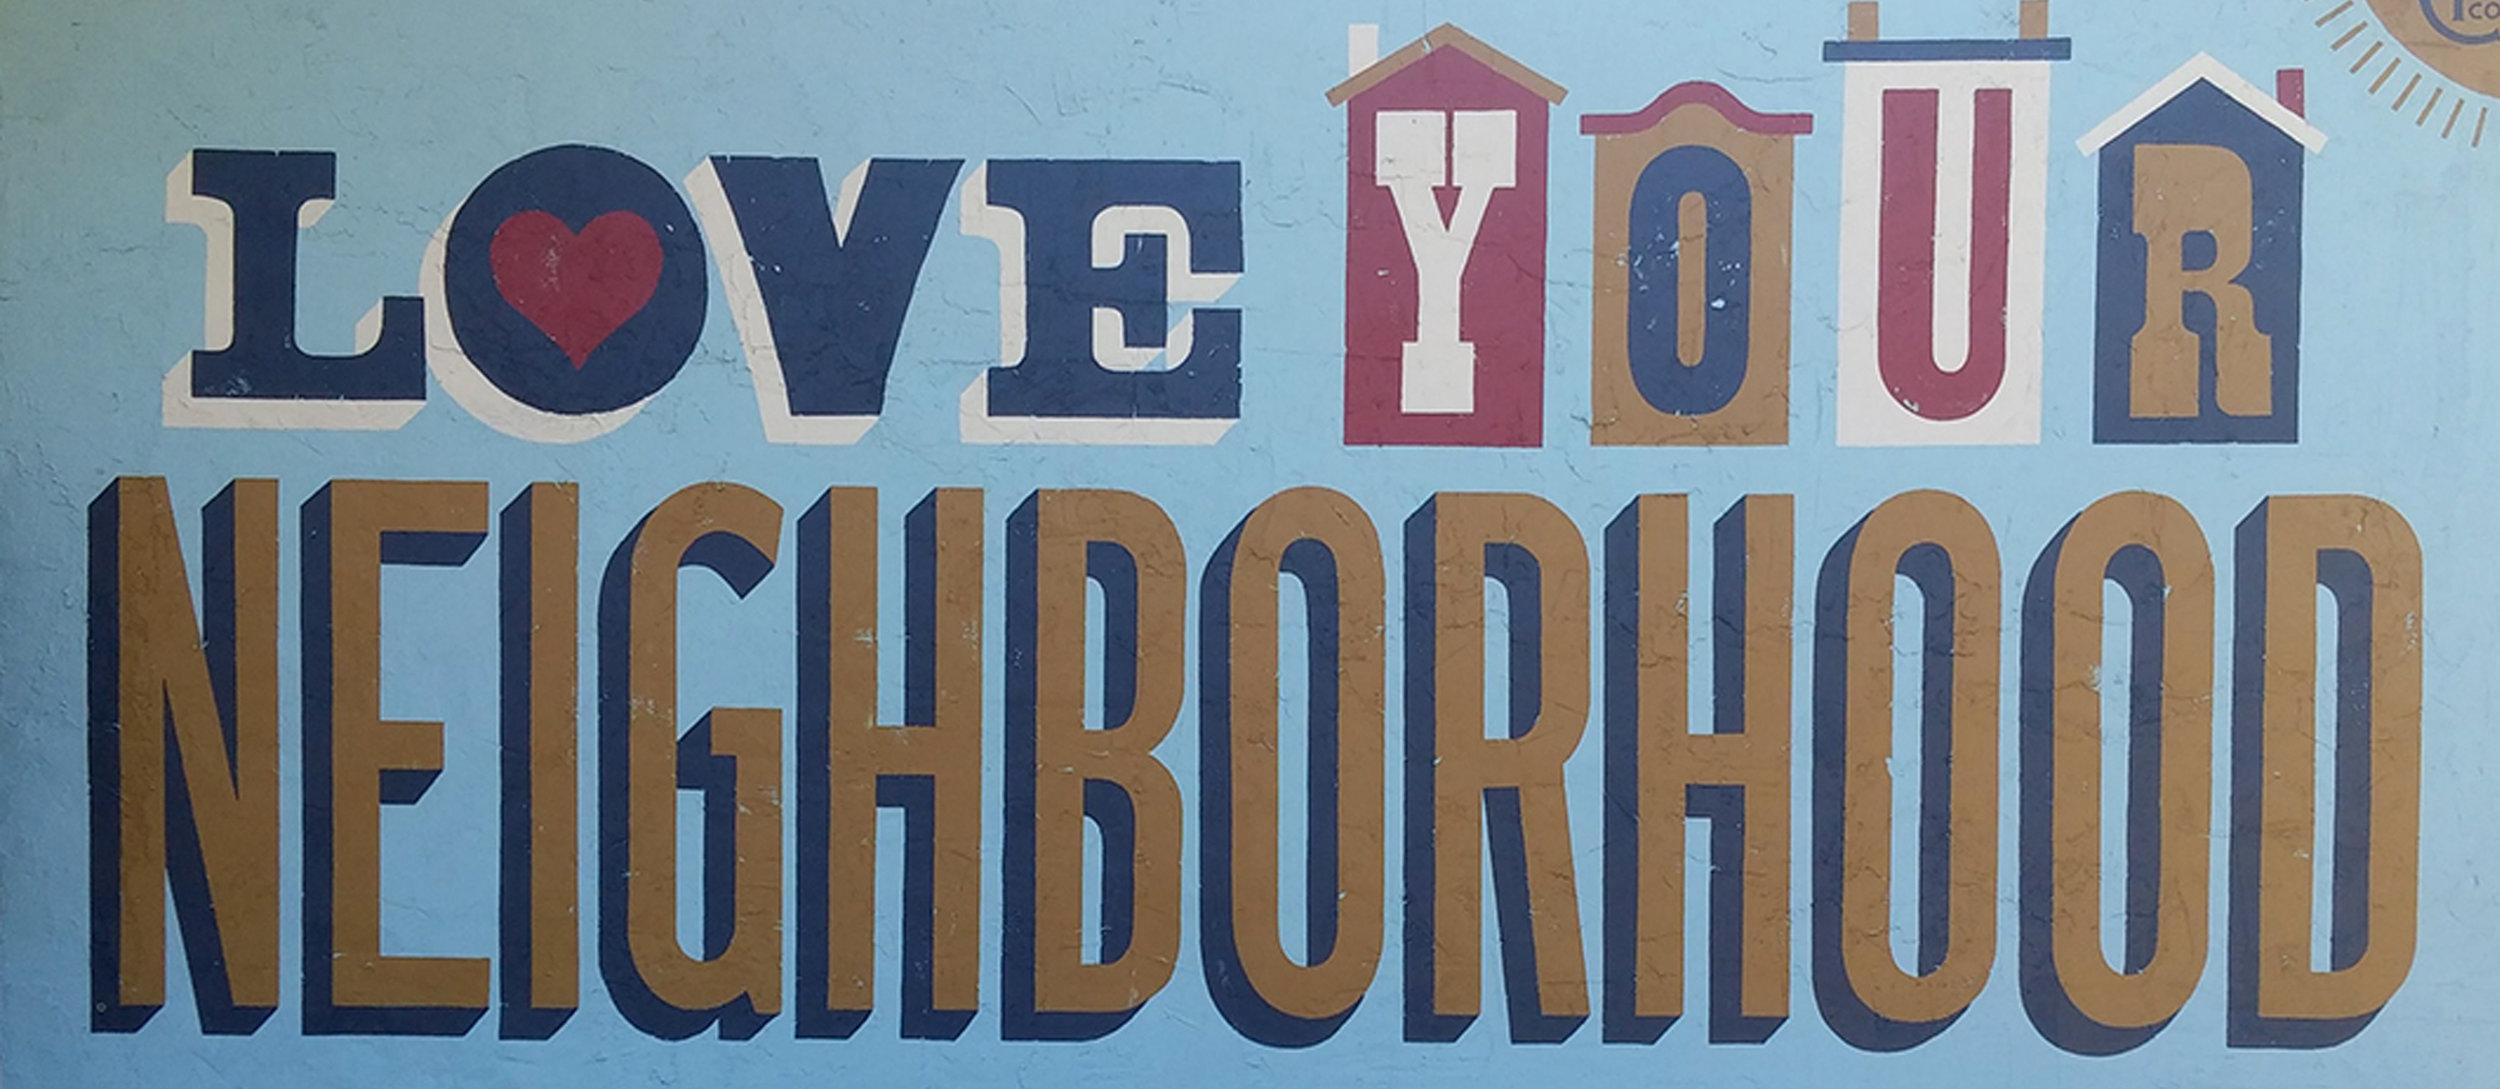 mural in st. petersburg, florida